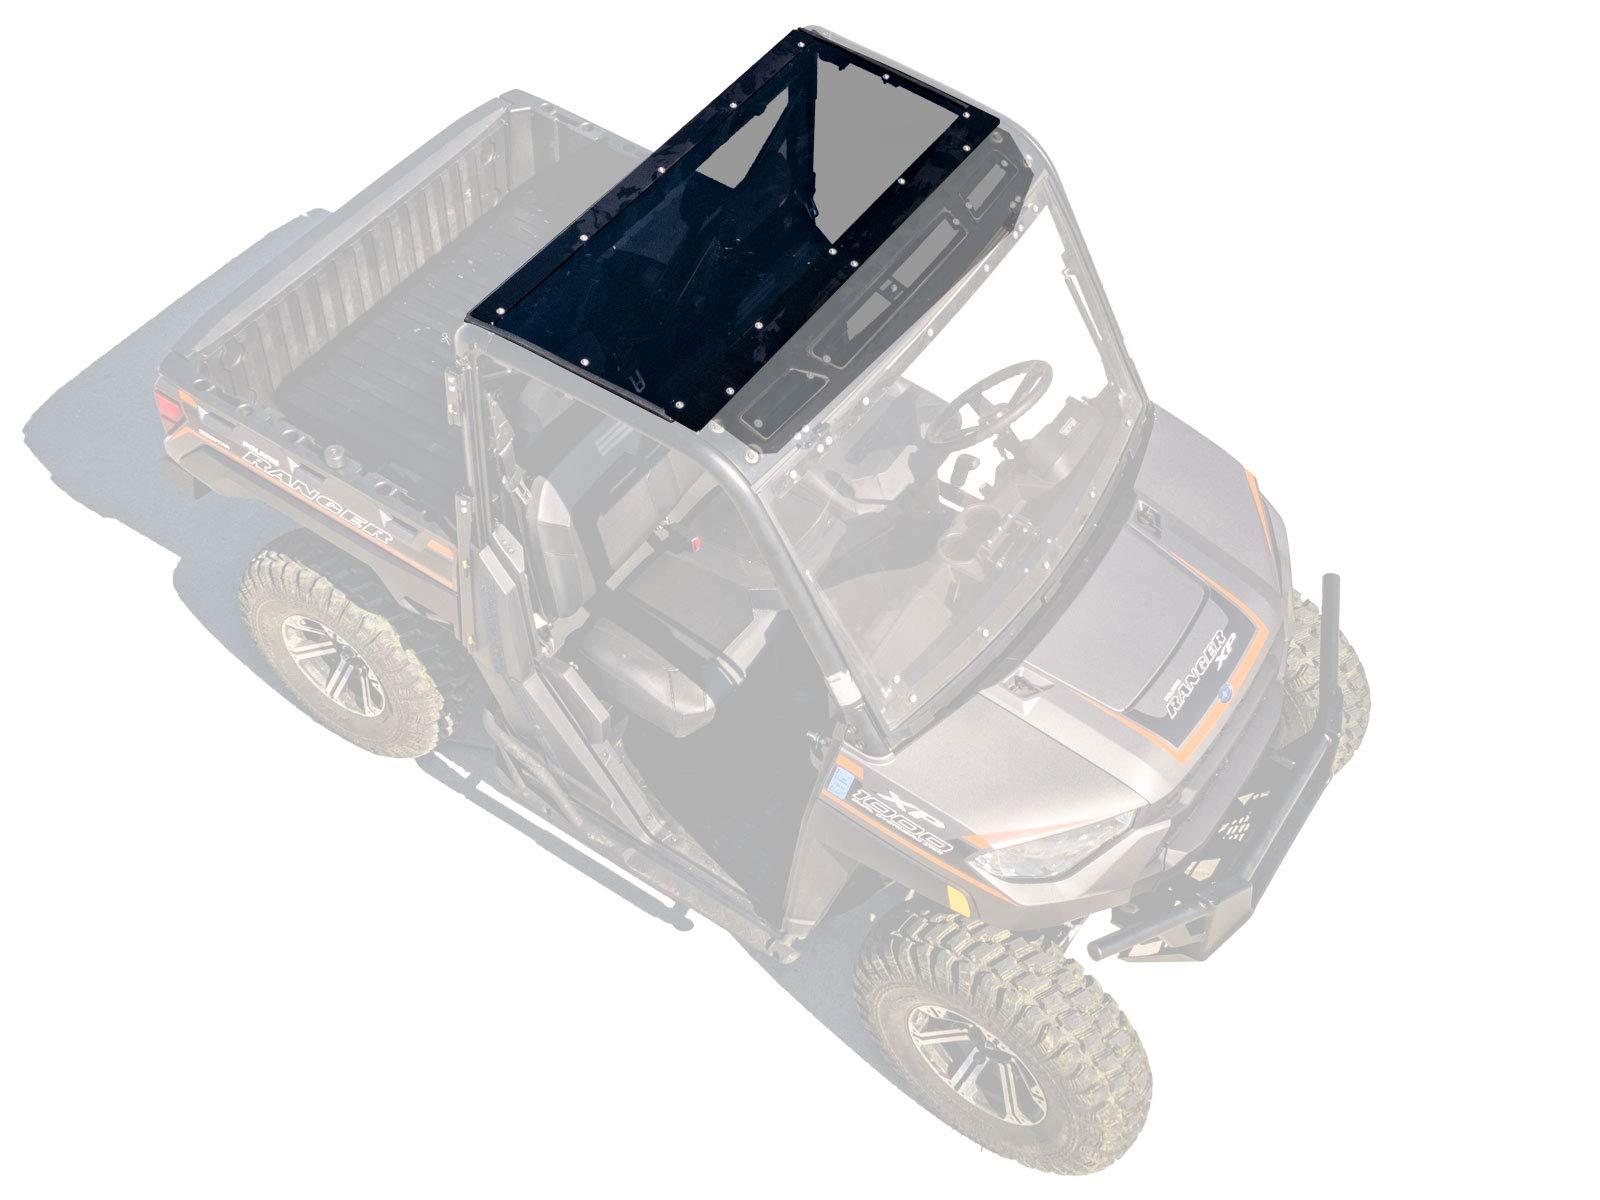 SuperATV Dark Tinted Roof for Polaris Ranger XP 900 (2013+) - Easy to Install! by SuperATV.com